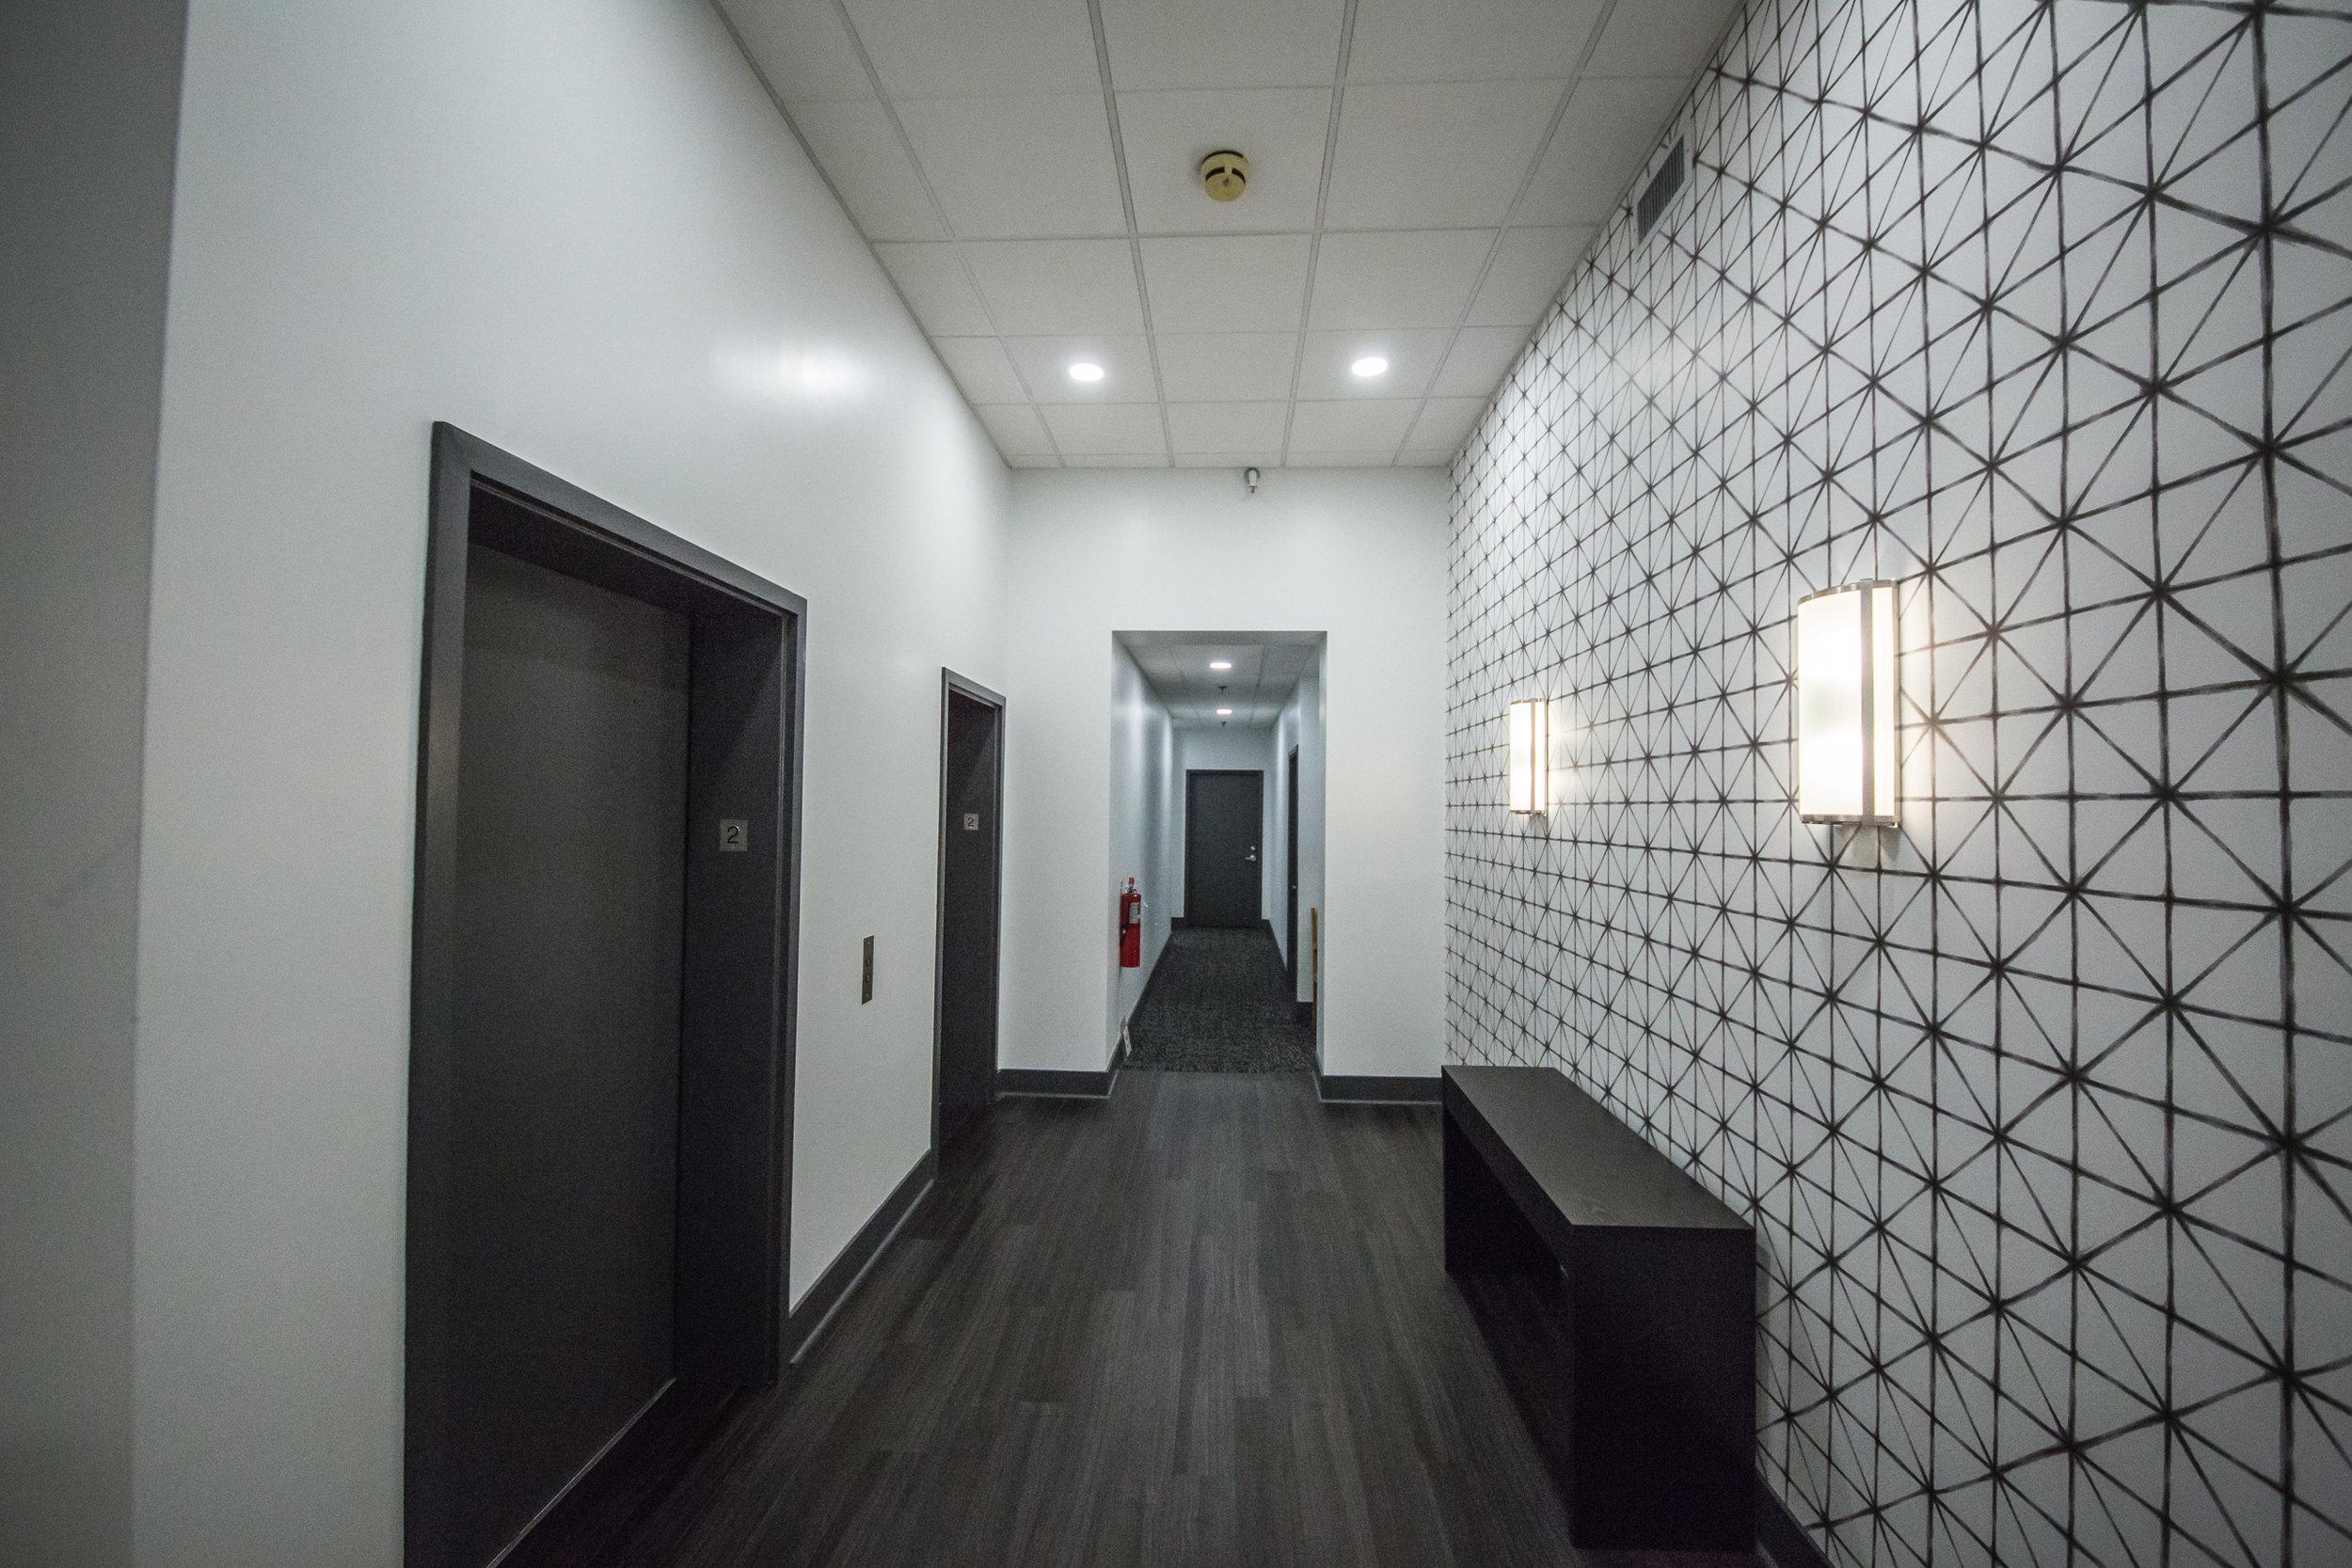 18 S Hall.jpg